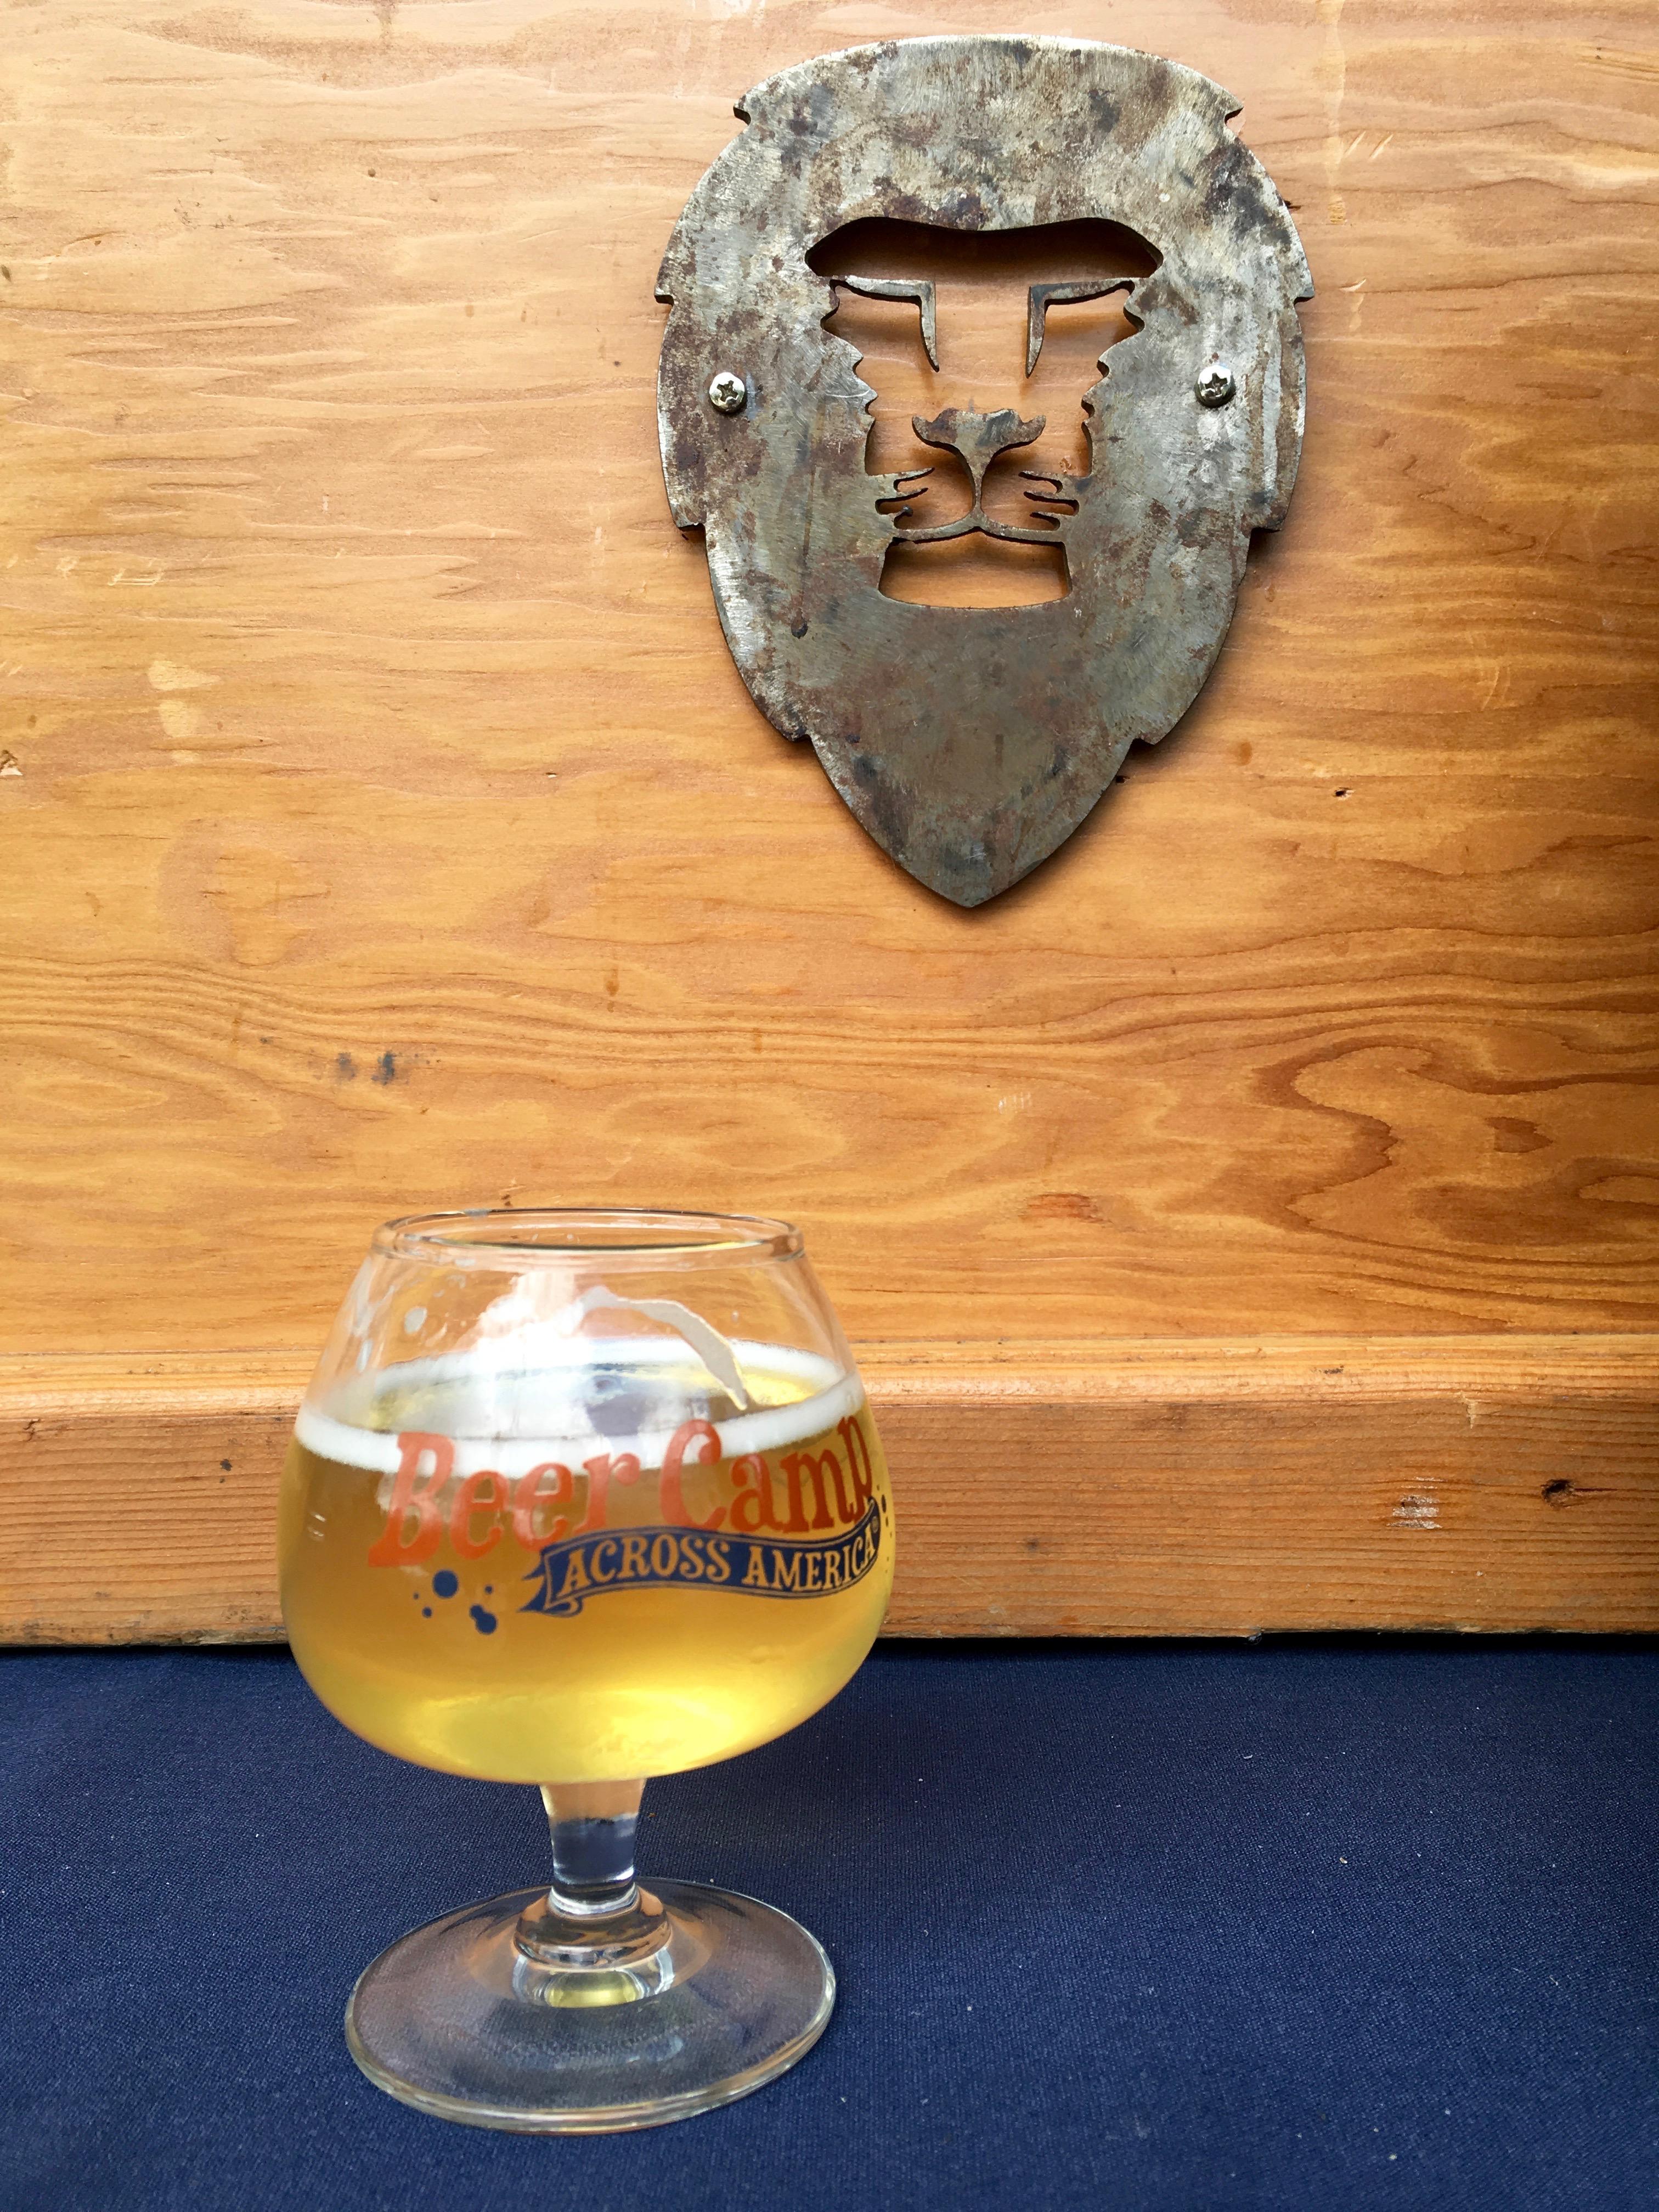 Aslan Brewing Disco Lemonade Berliner Weisse was a highlight at the Sierra Nevada Brewing Beer Camp Across America Festival stop in Seattle, WA in June of 2016. (photo by D.J. Paul)